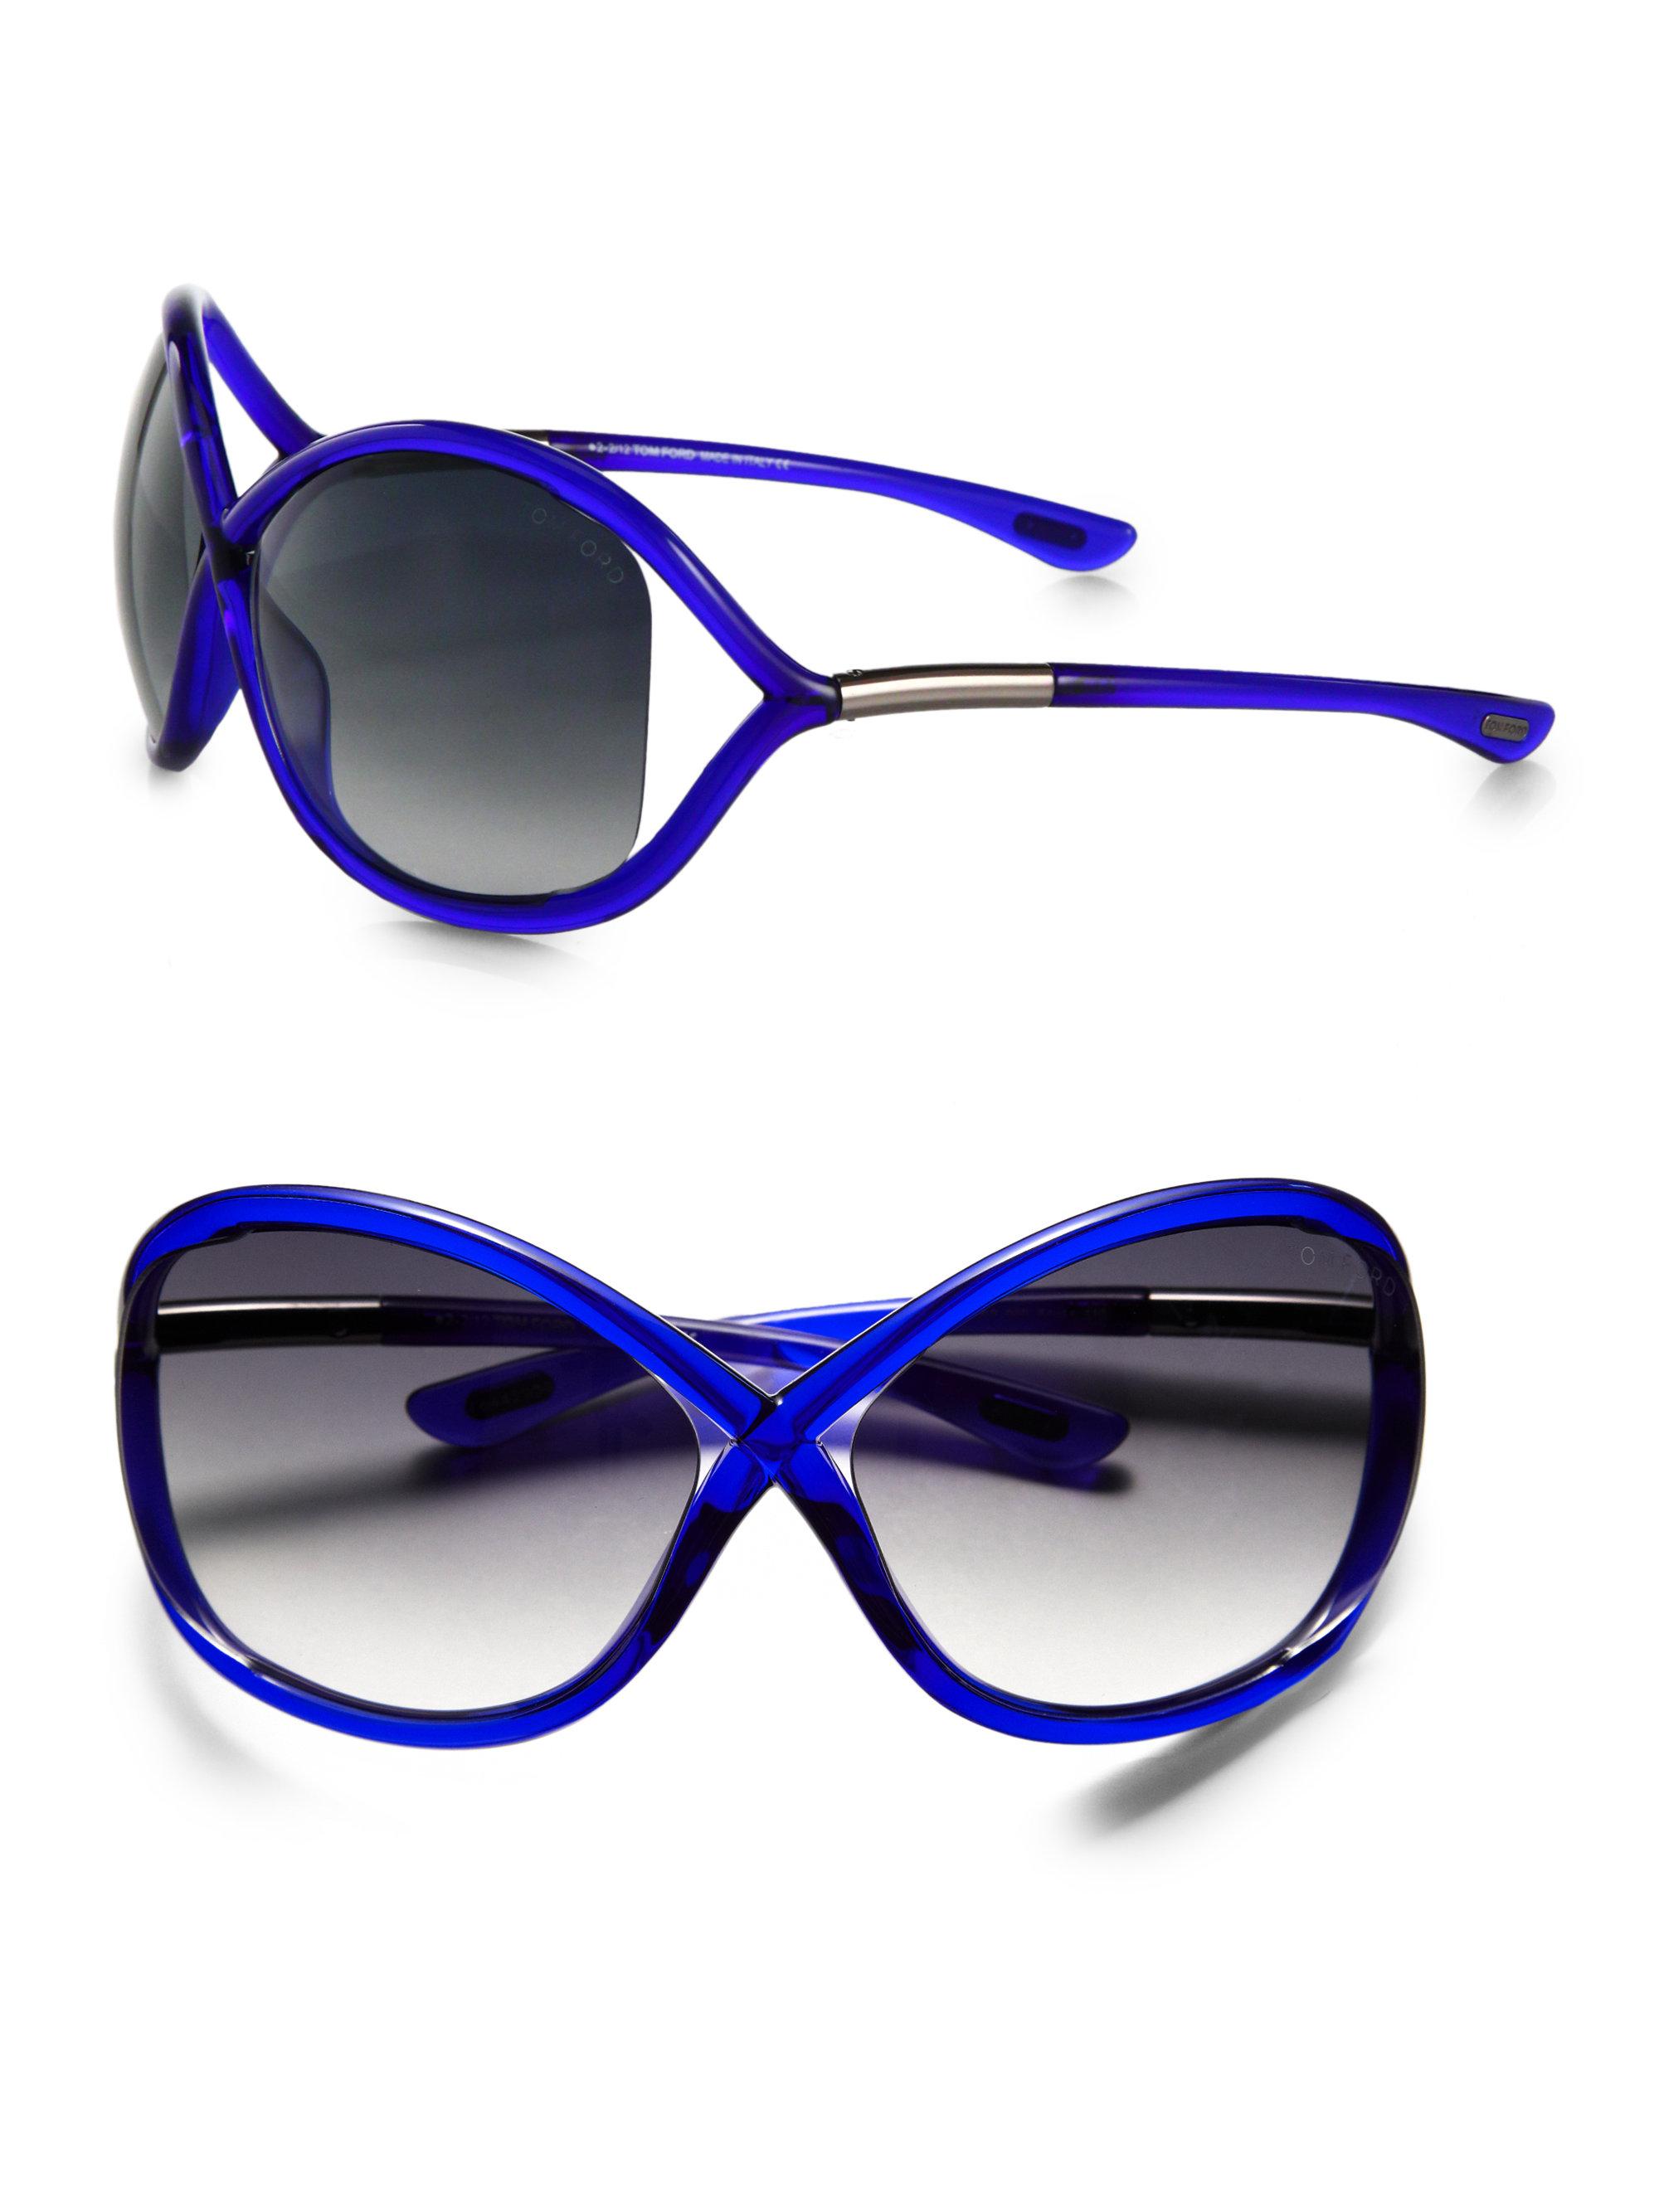 27243364ceb4a Tom Ford Whitney Polarized Sunglasses